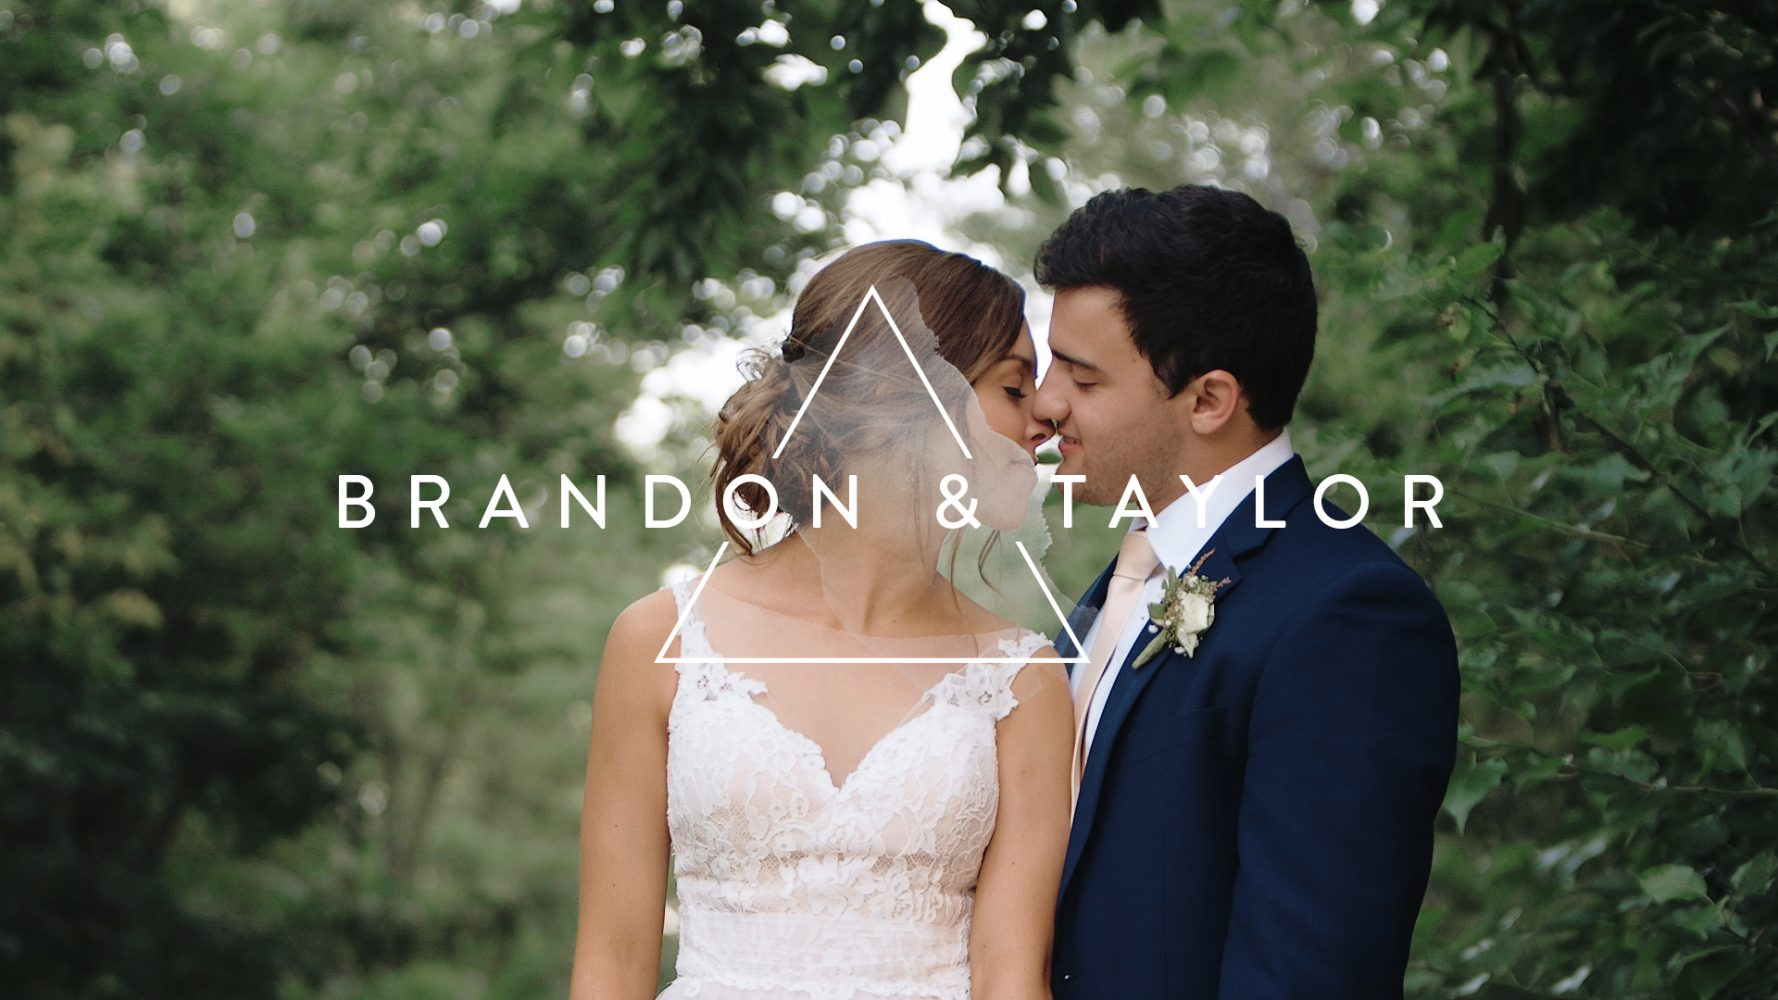 Brandon + Taylor   Wichita, Kansas   Noah's Event Venue